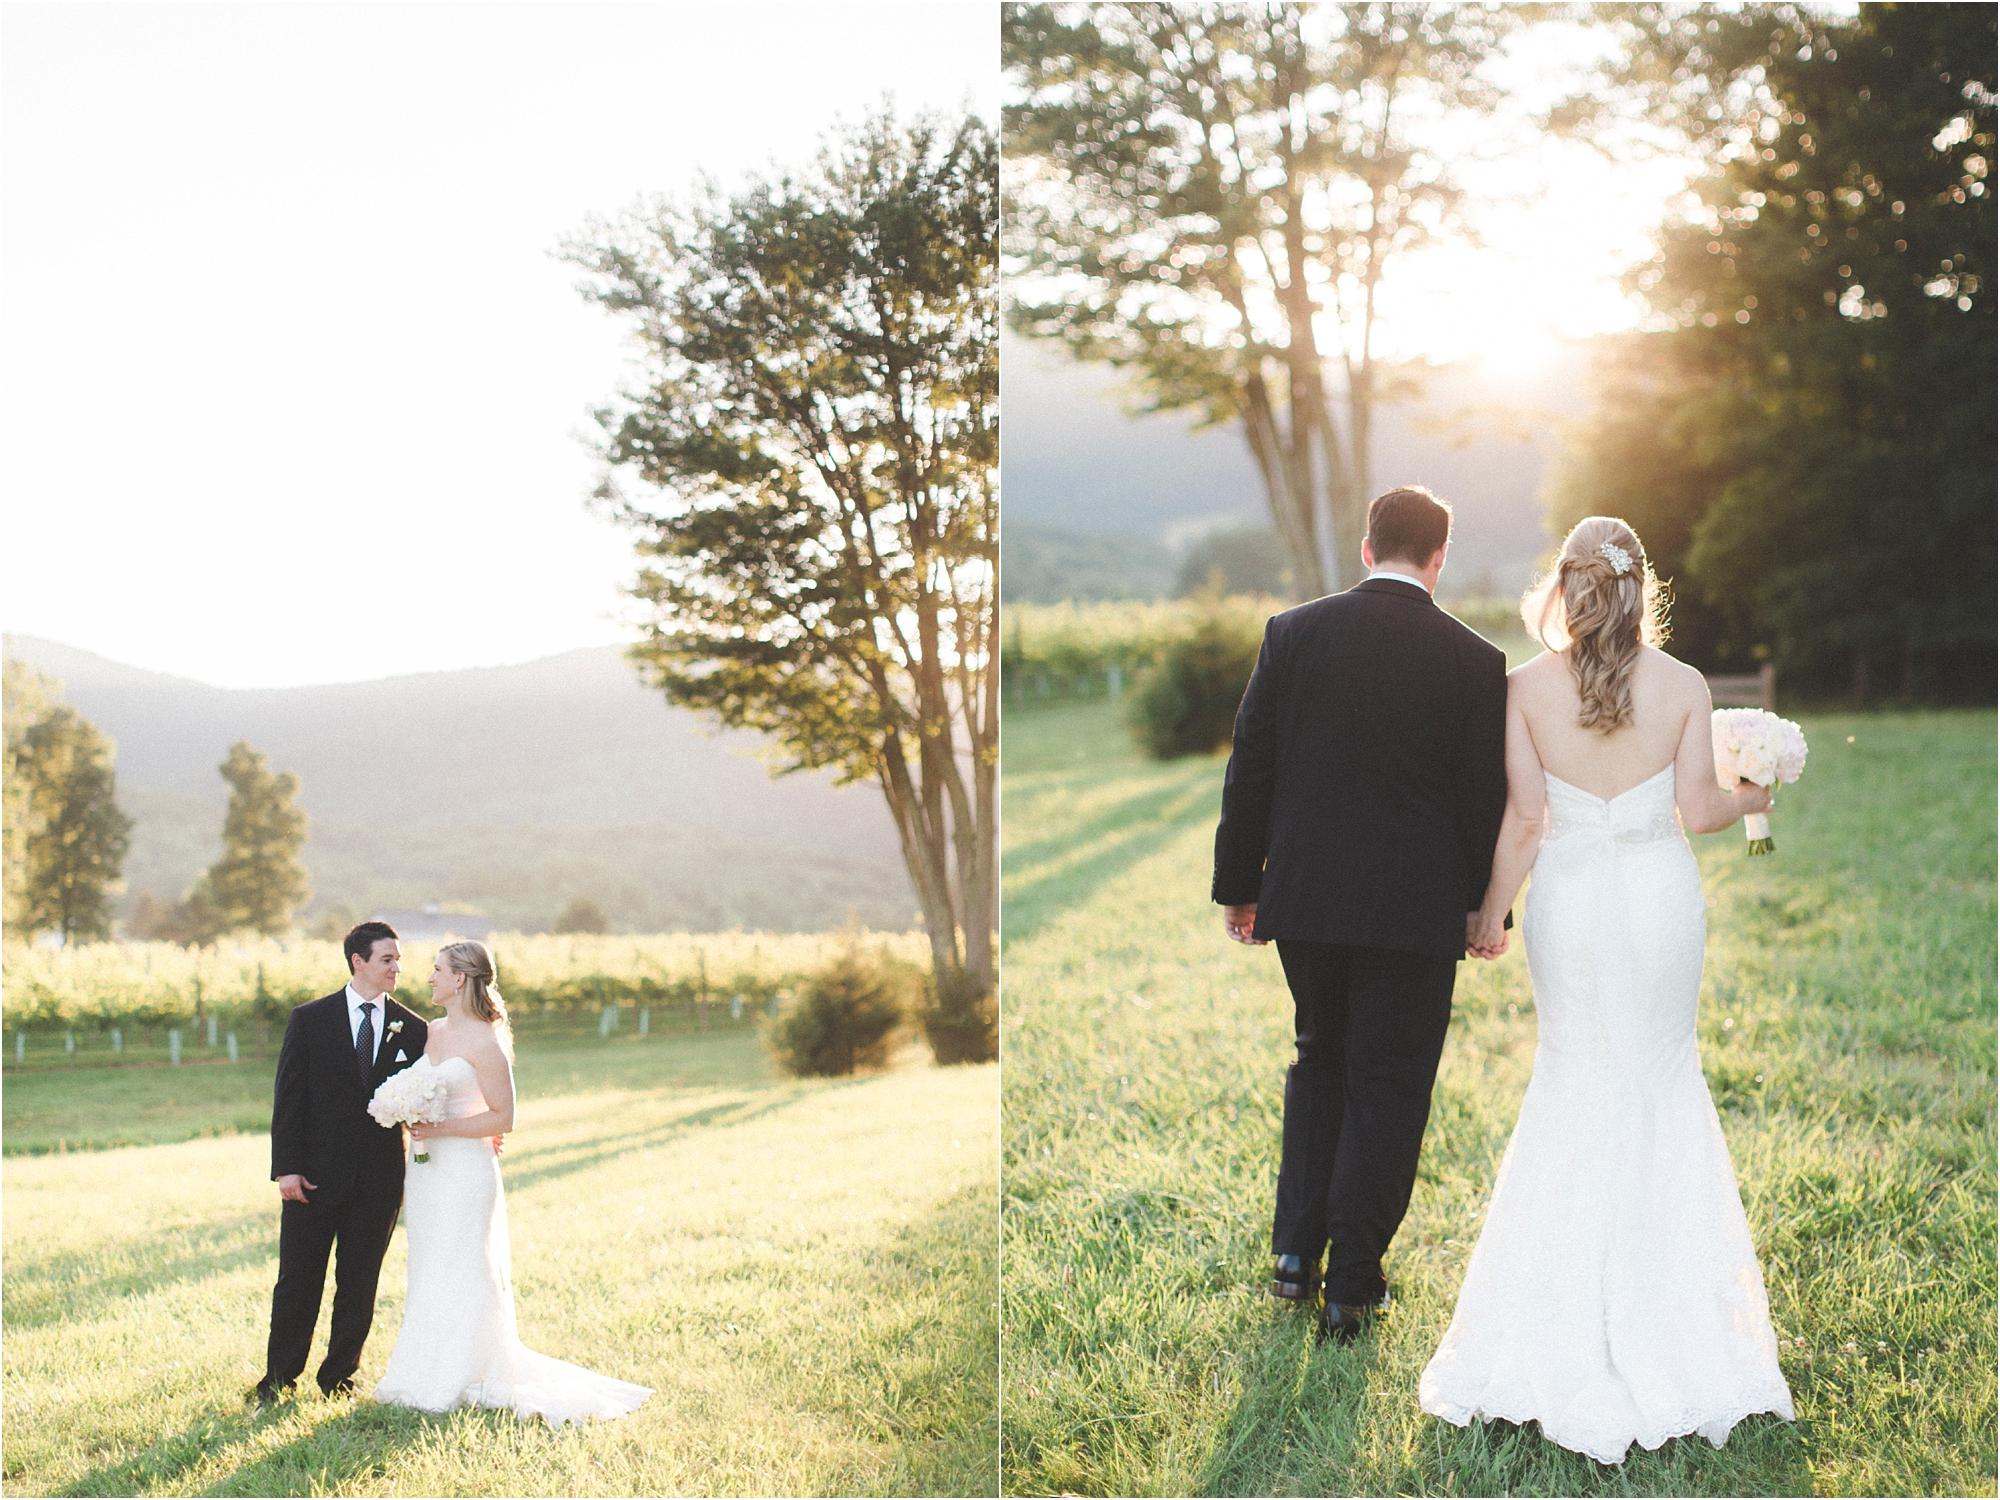 liz-mike-veritas-winery-charlottesville-virginia-wedding-photos_0027.jpg